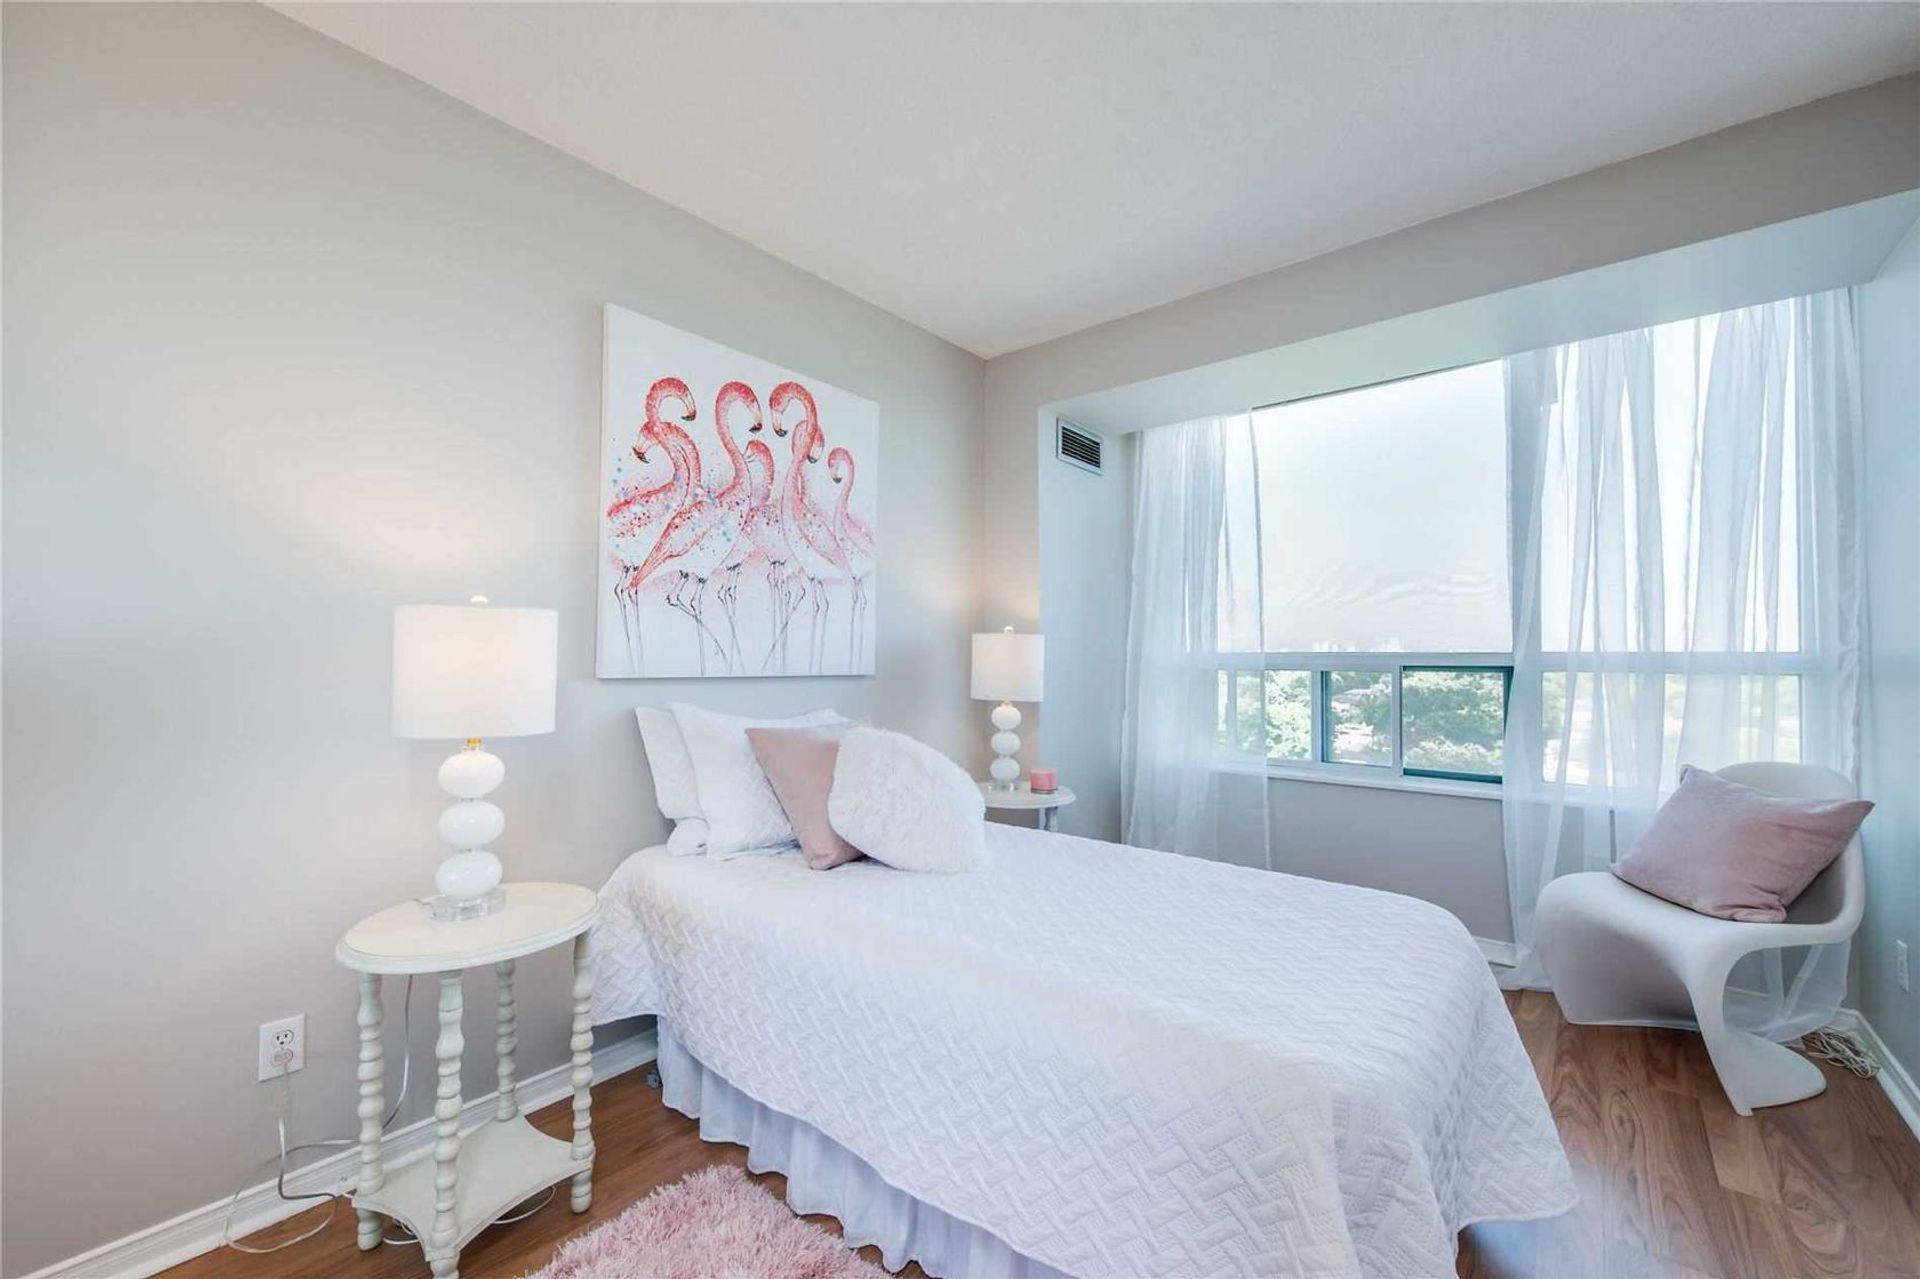 238-doris-ave-willowdale-east-toronto-14 at 1705 - 238 Doris Avenue, Willowdale East, Toronto